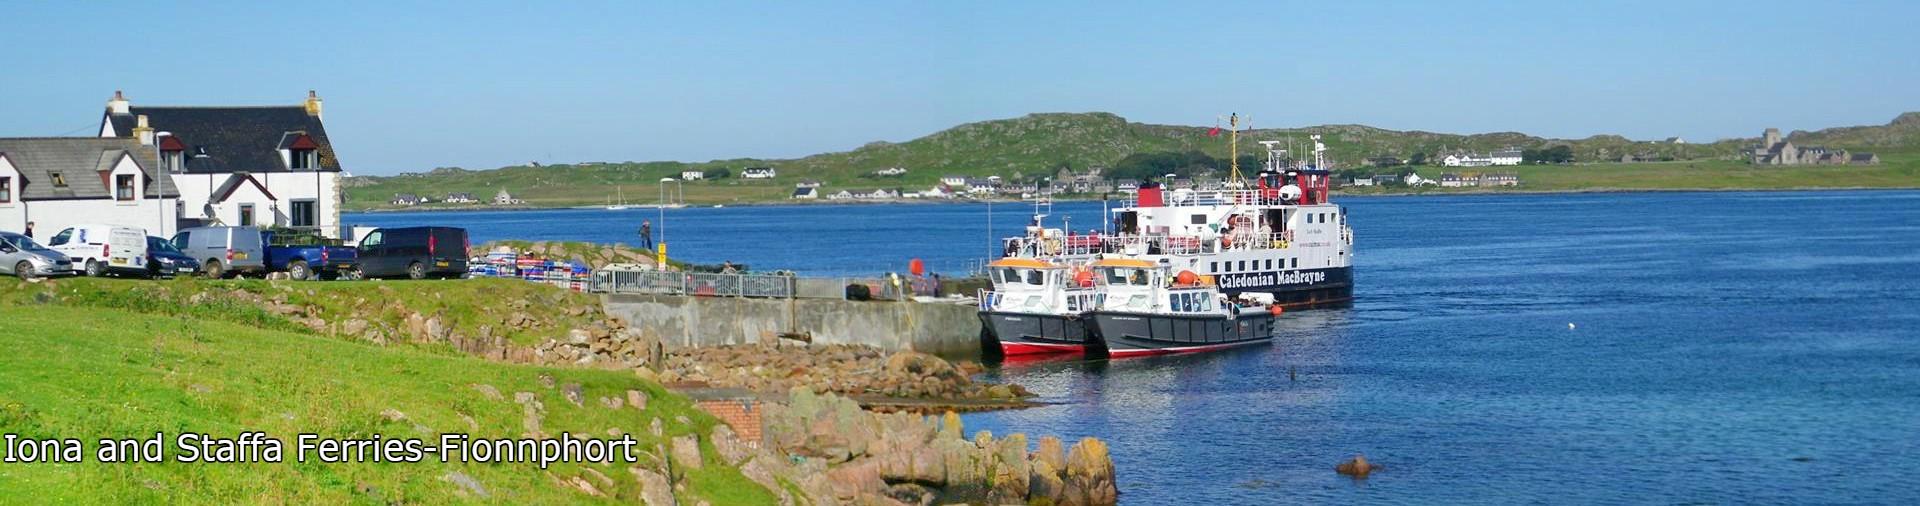 Fionnphort, Mull, Iona, Staffa,ferries